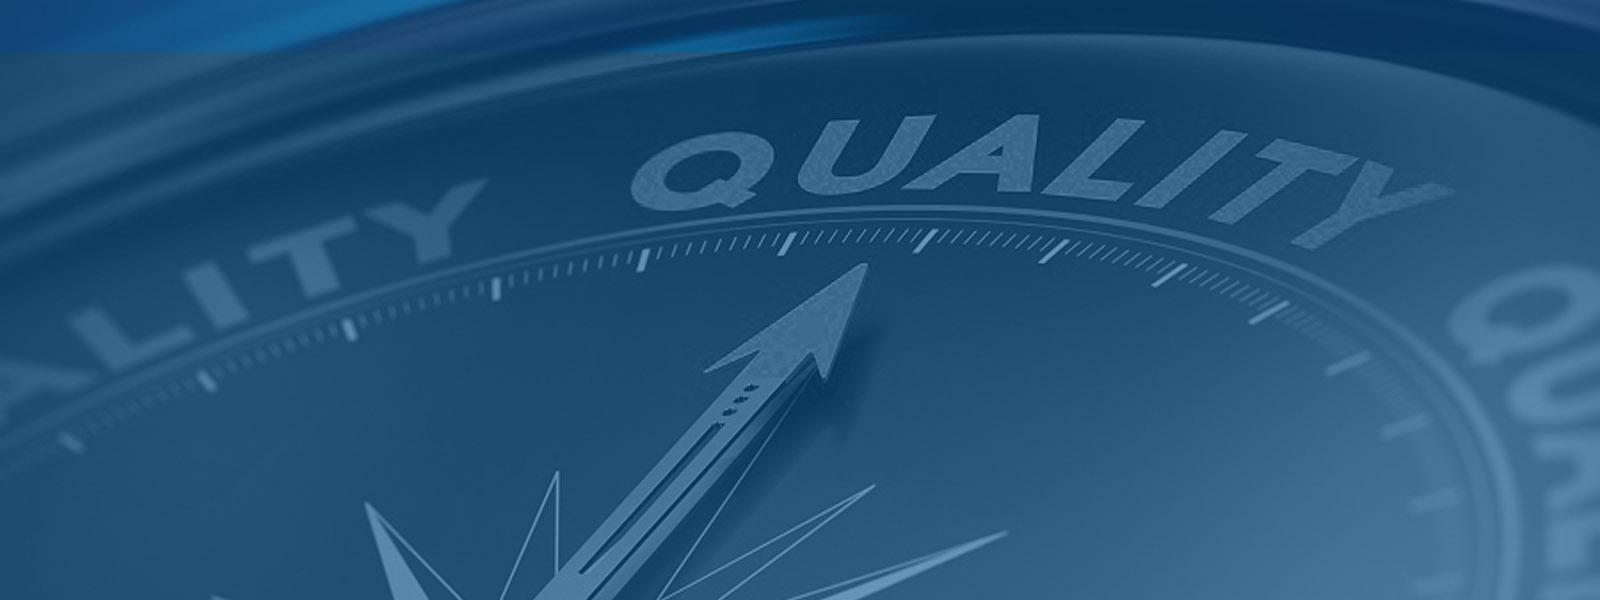 Quality-Assurance-2